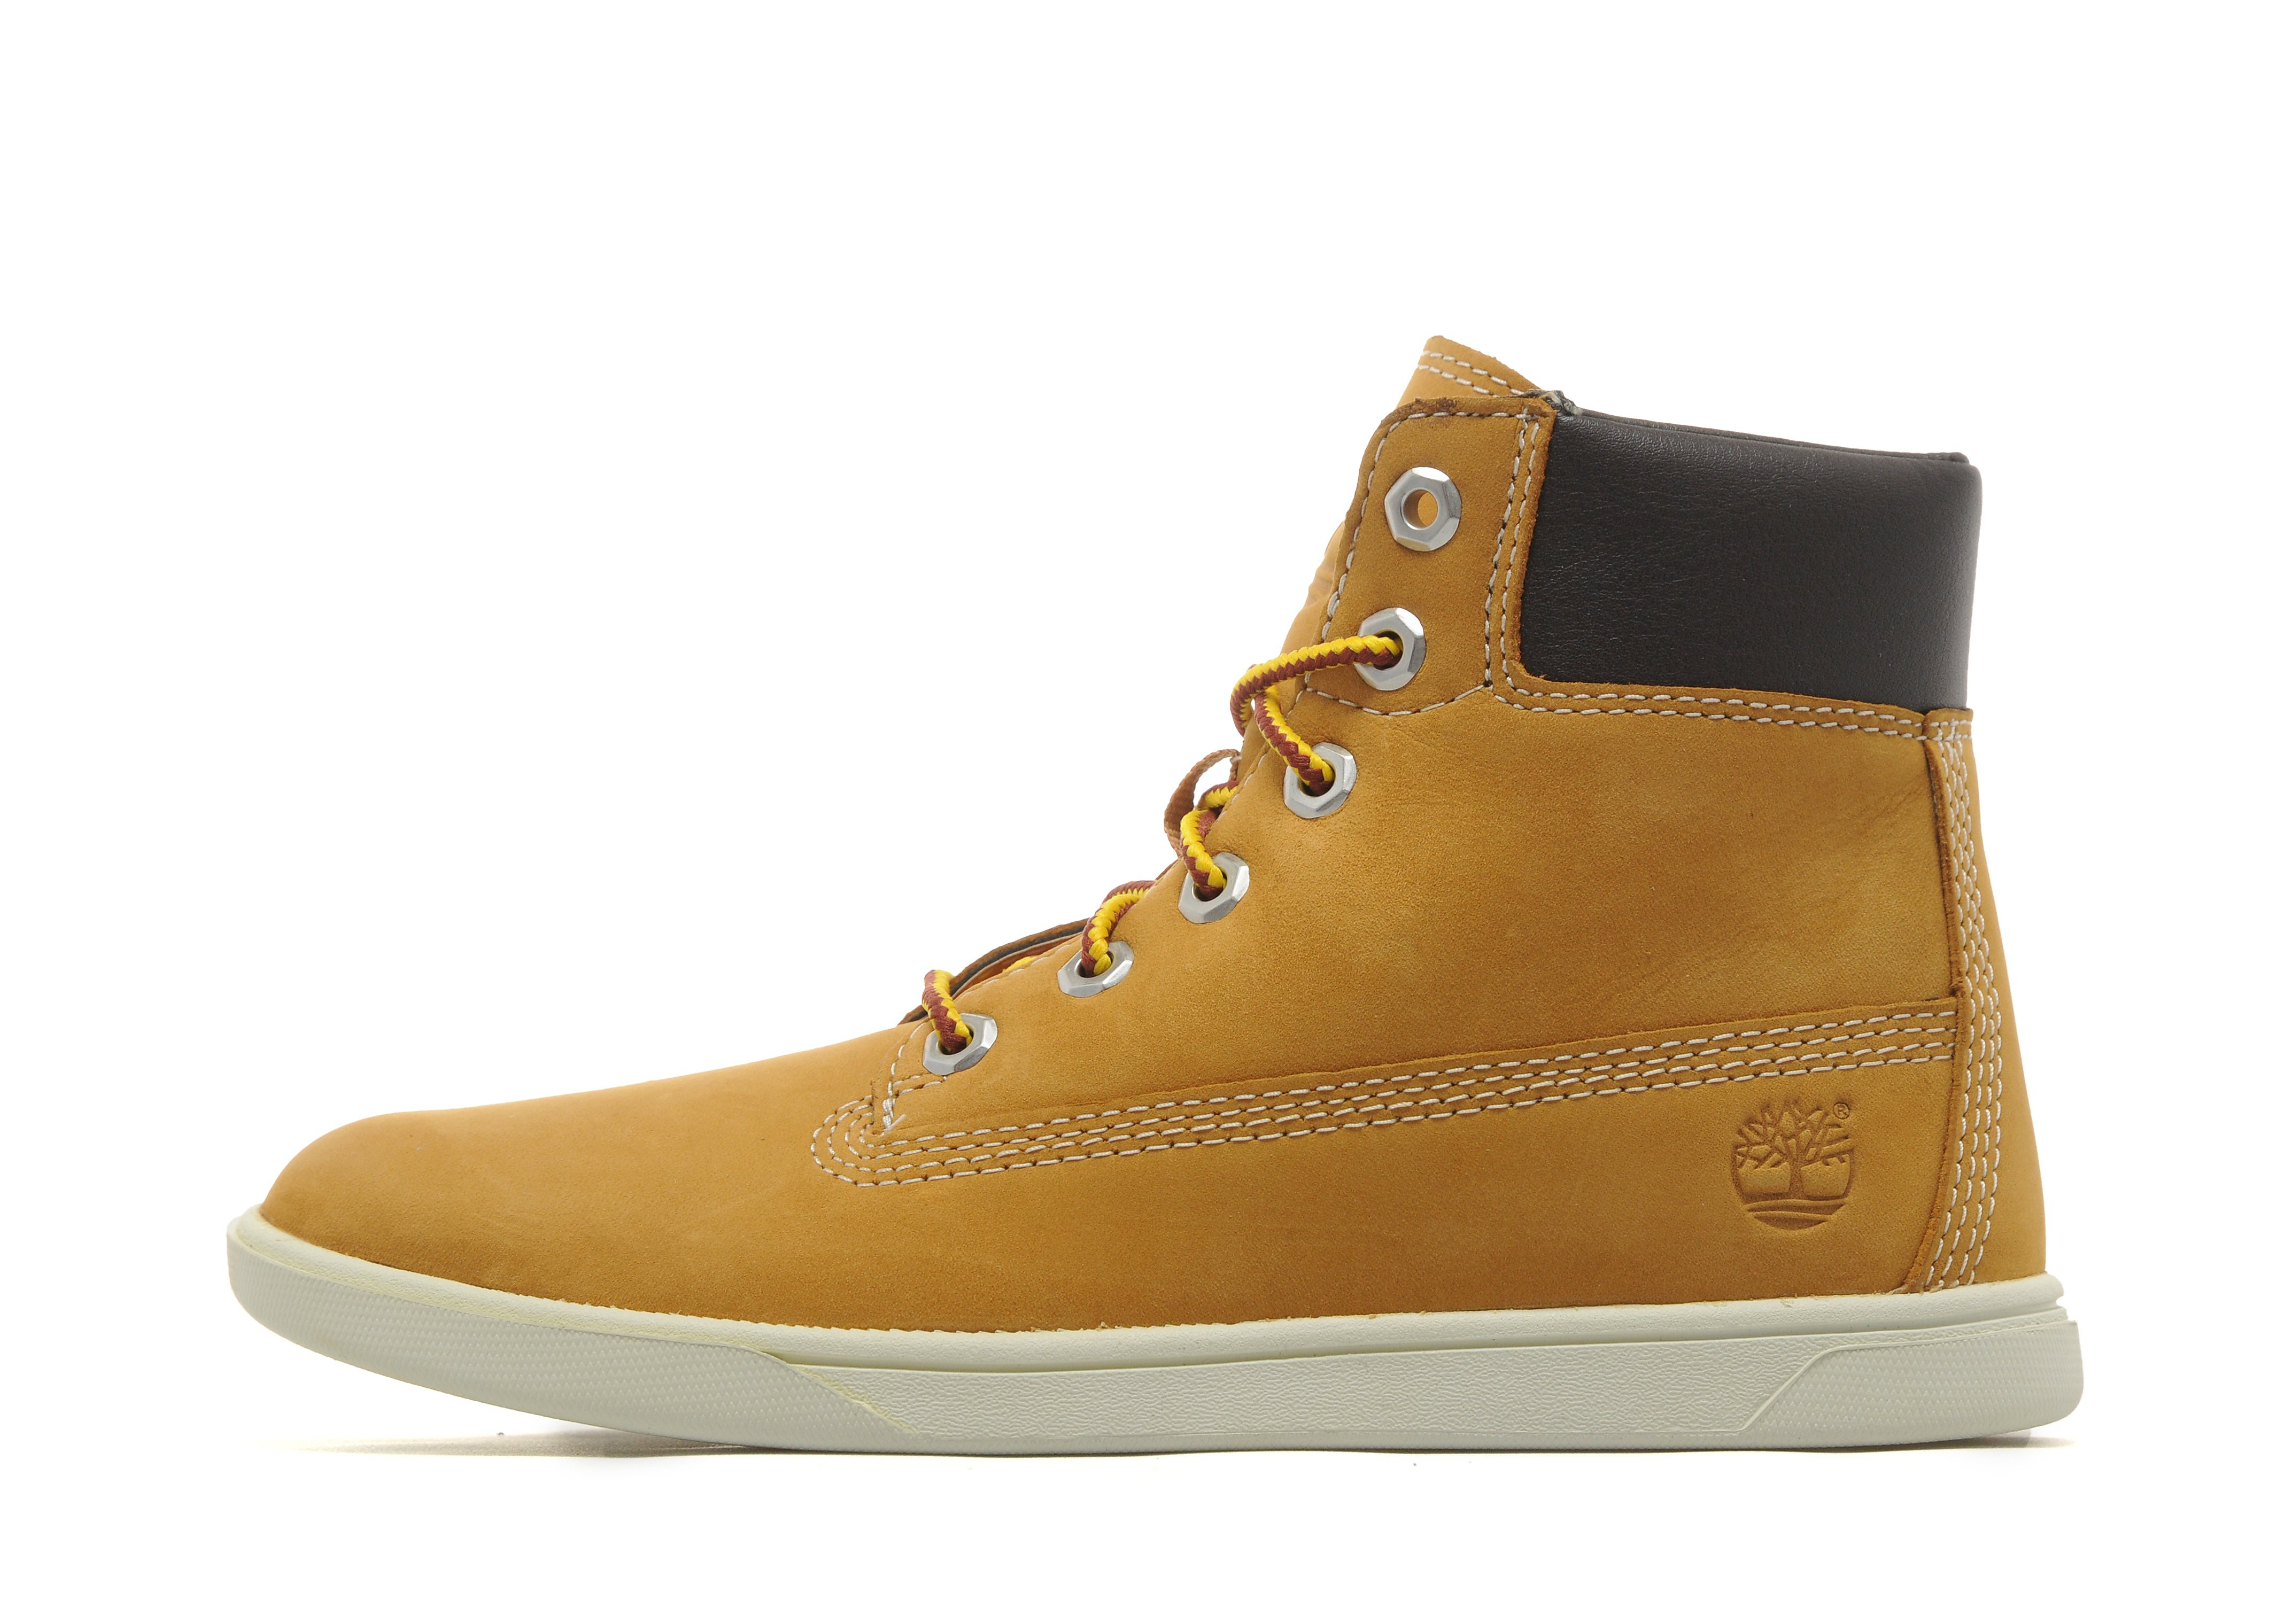 Timberland Groveton 6 Inch Boots Children